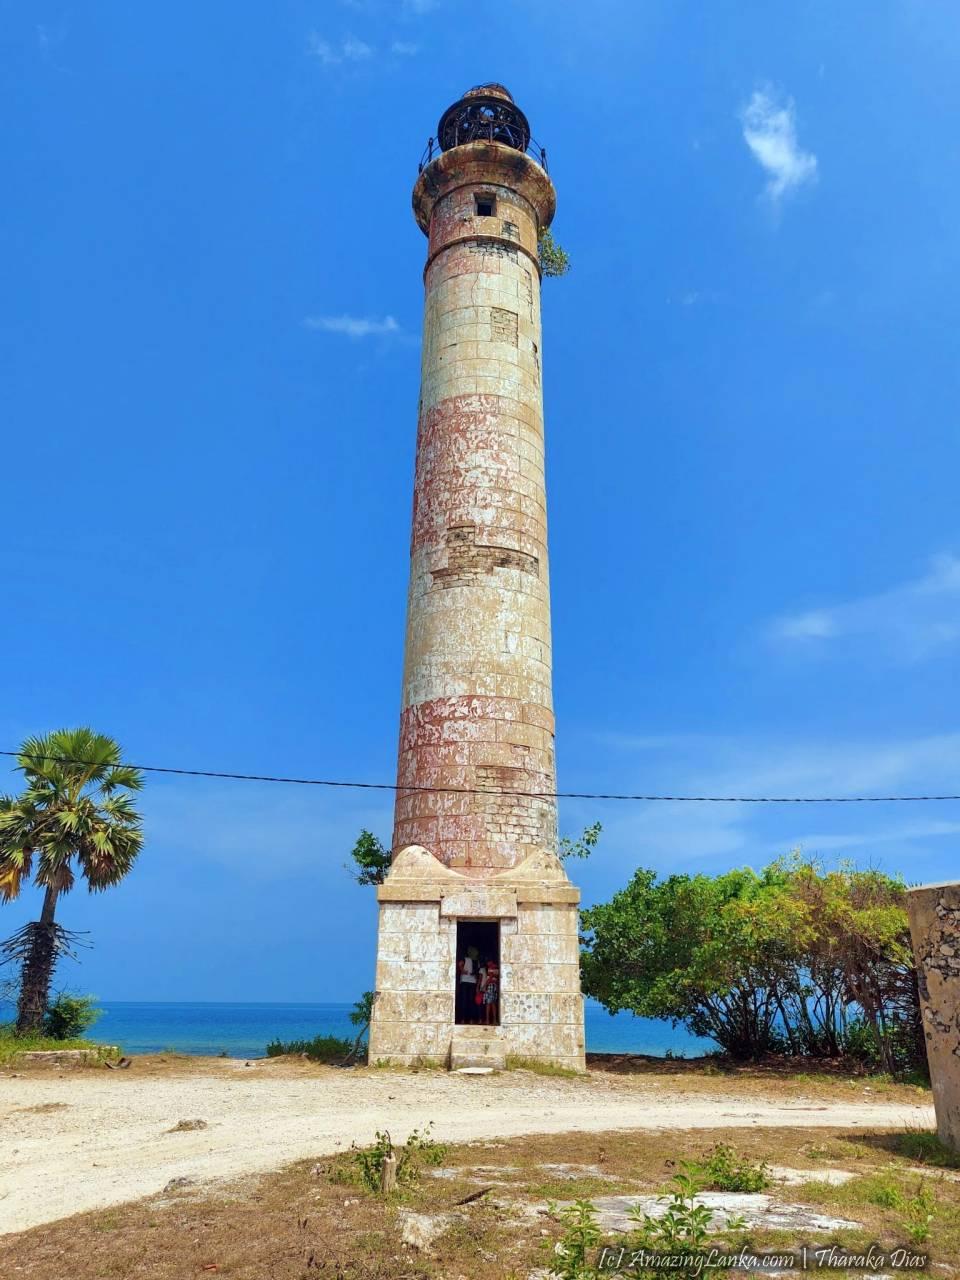 Kovilan Point Lighthouse at Karaitivu Island - කෝවිලන් තුඩුව ප්රදීපාගාරය